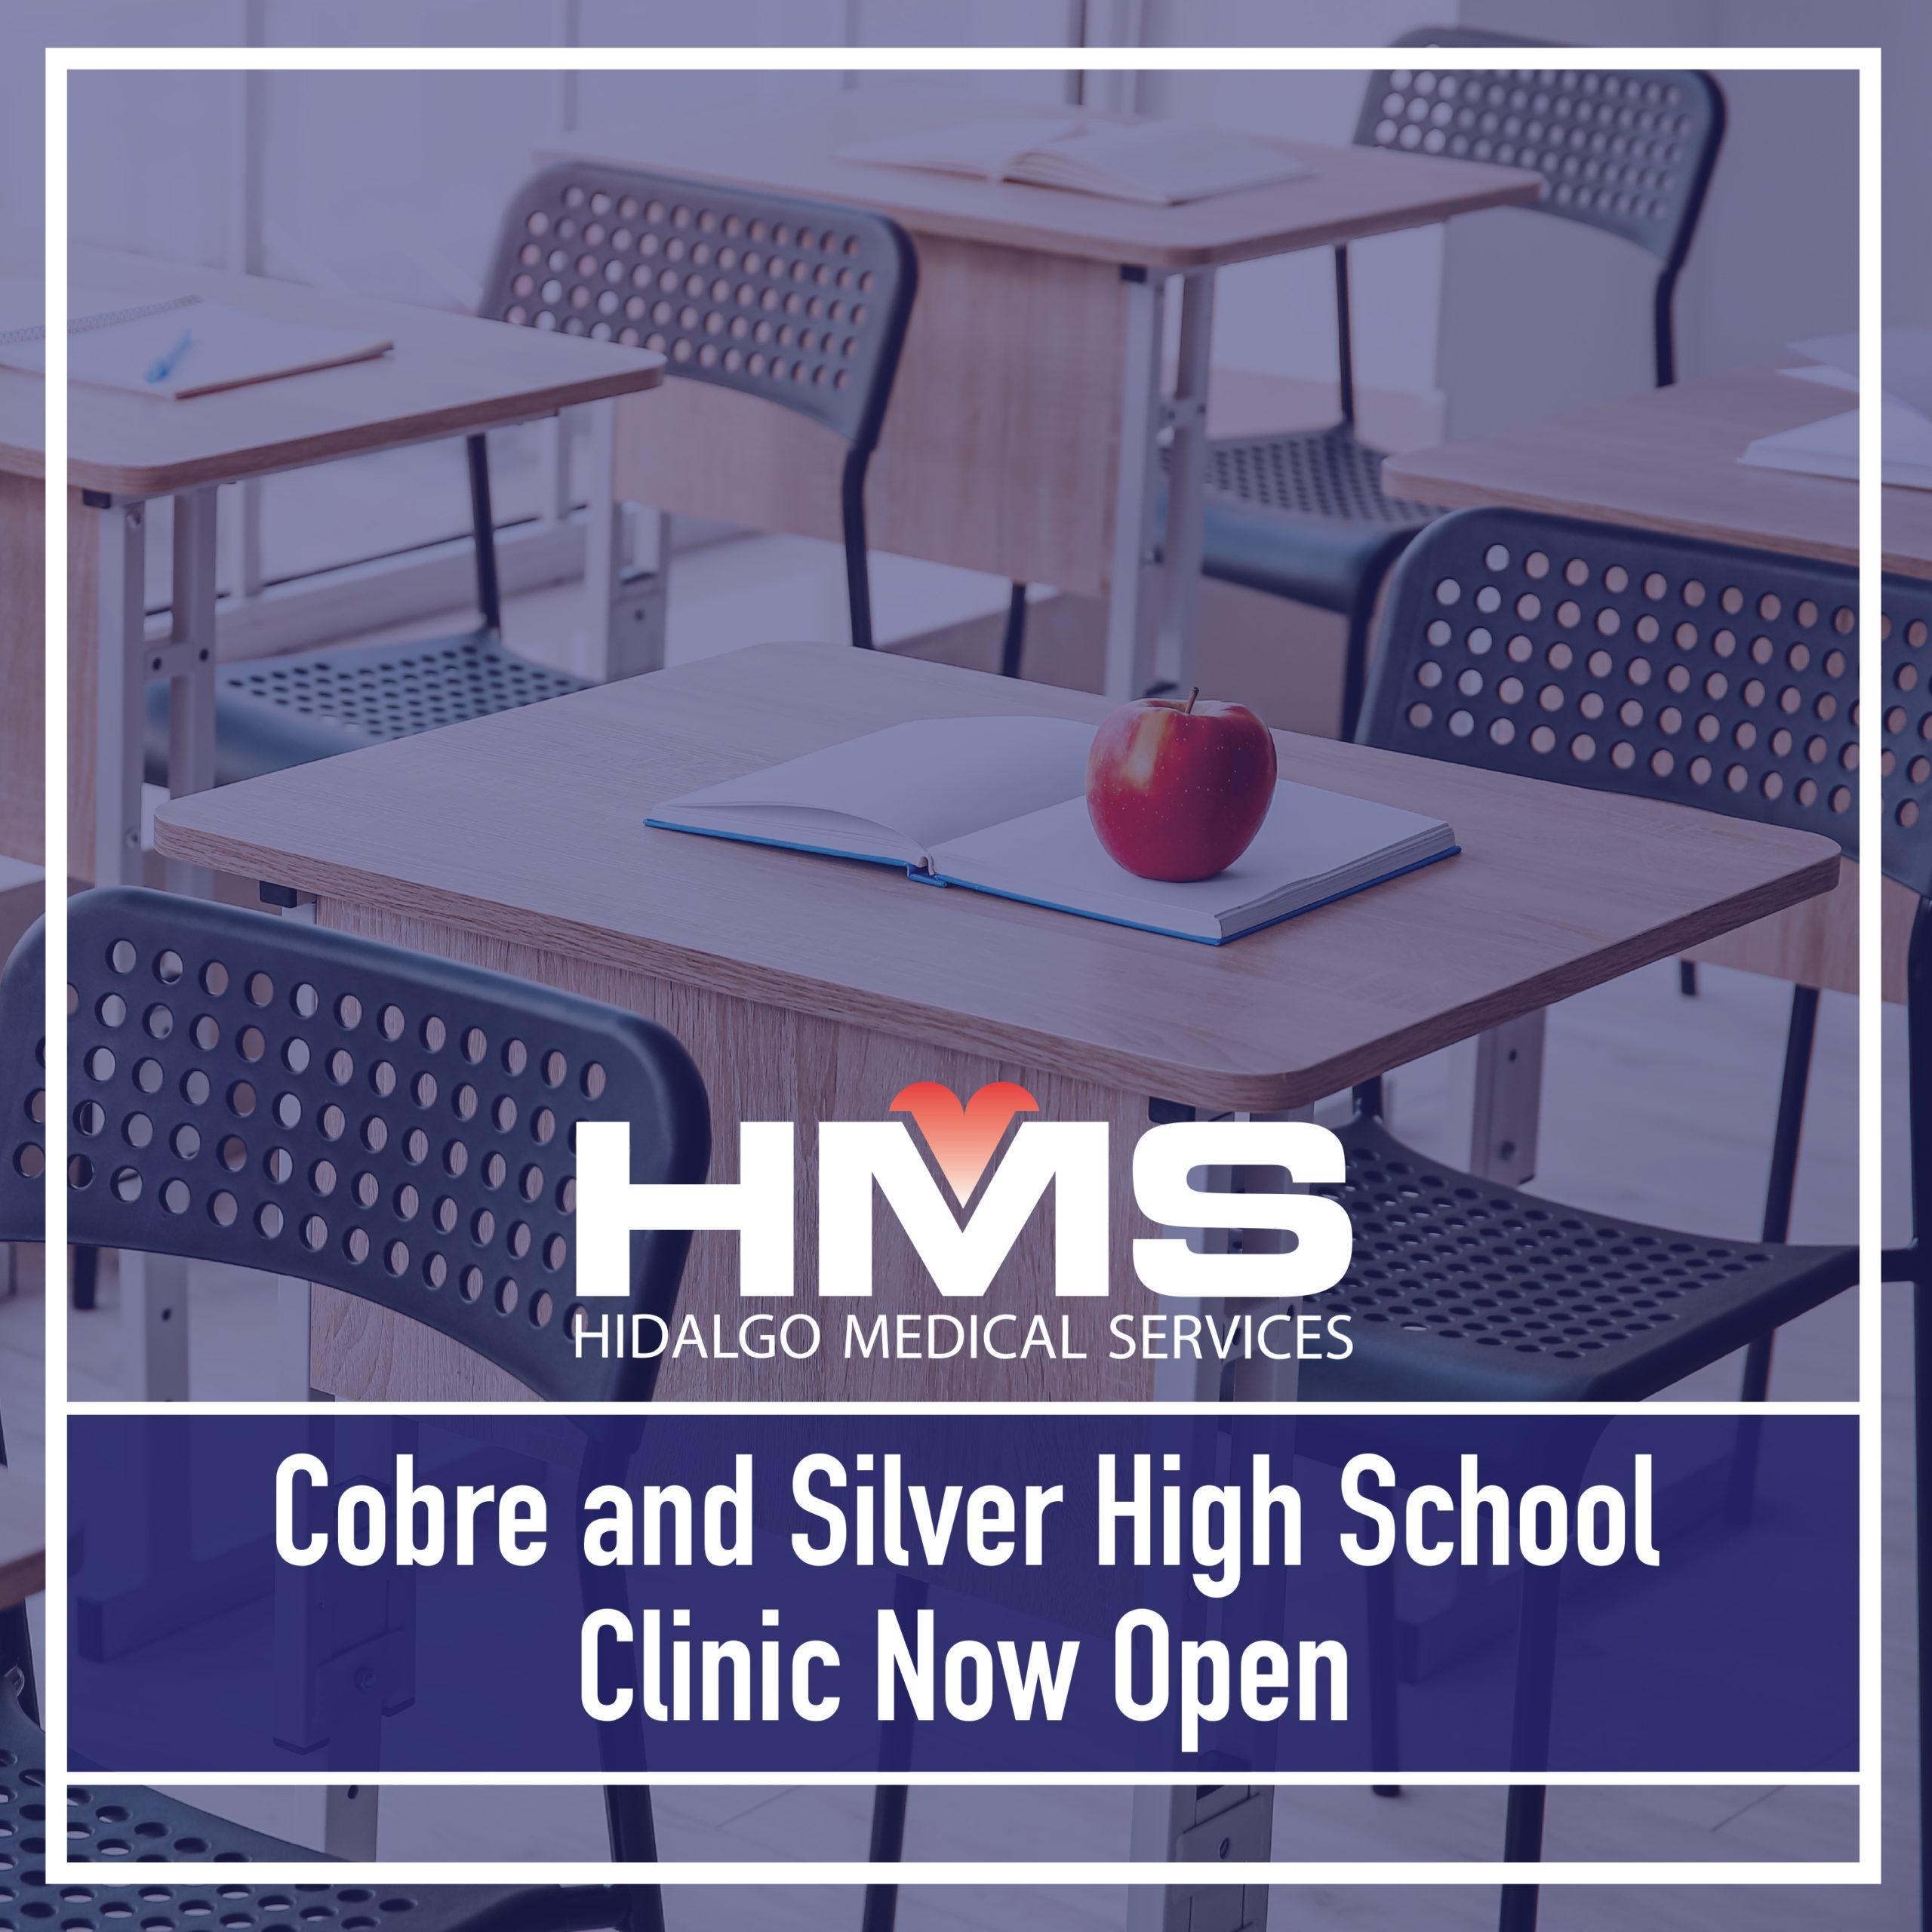 Cobre and Silver High School Clinics are Open!